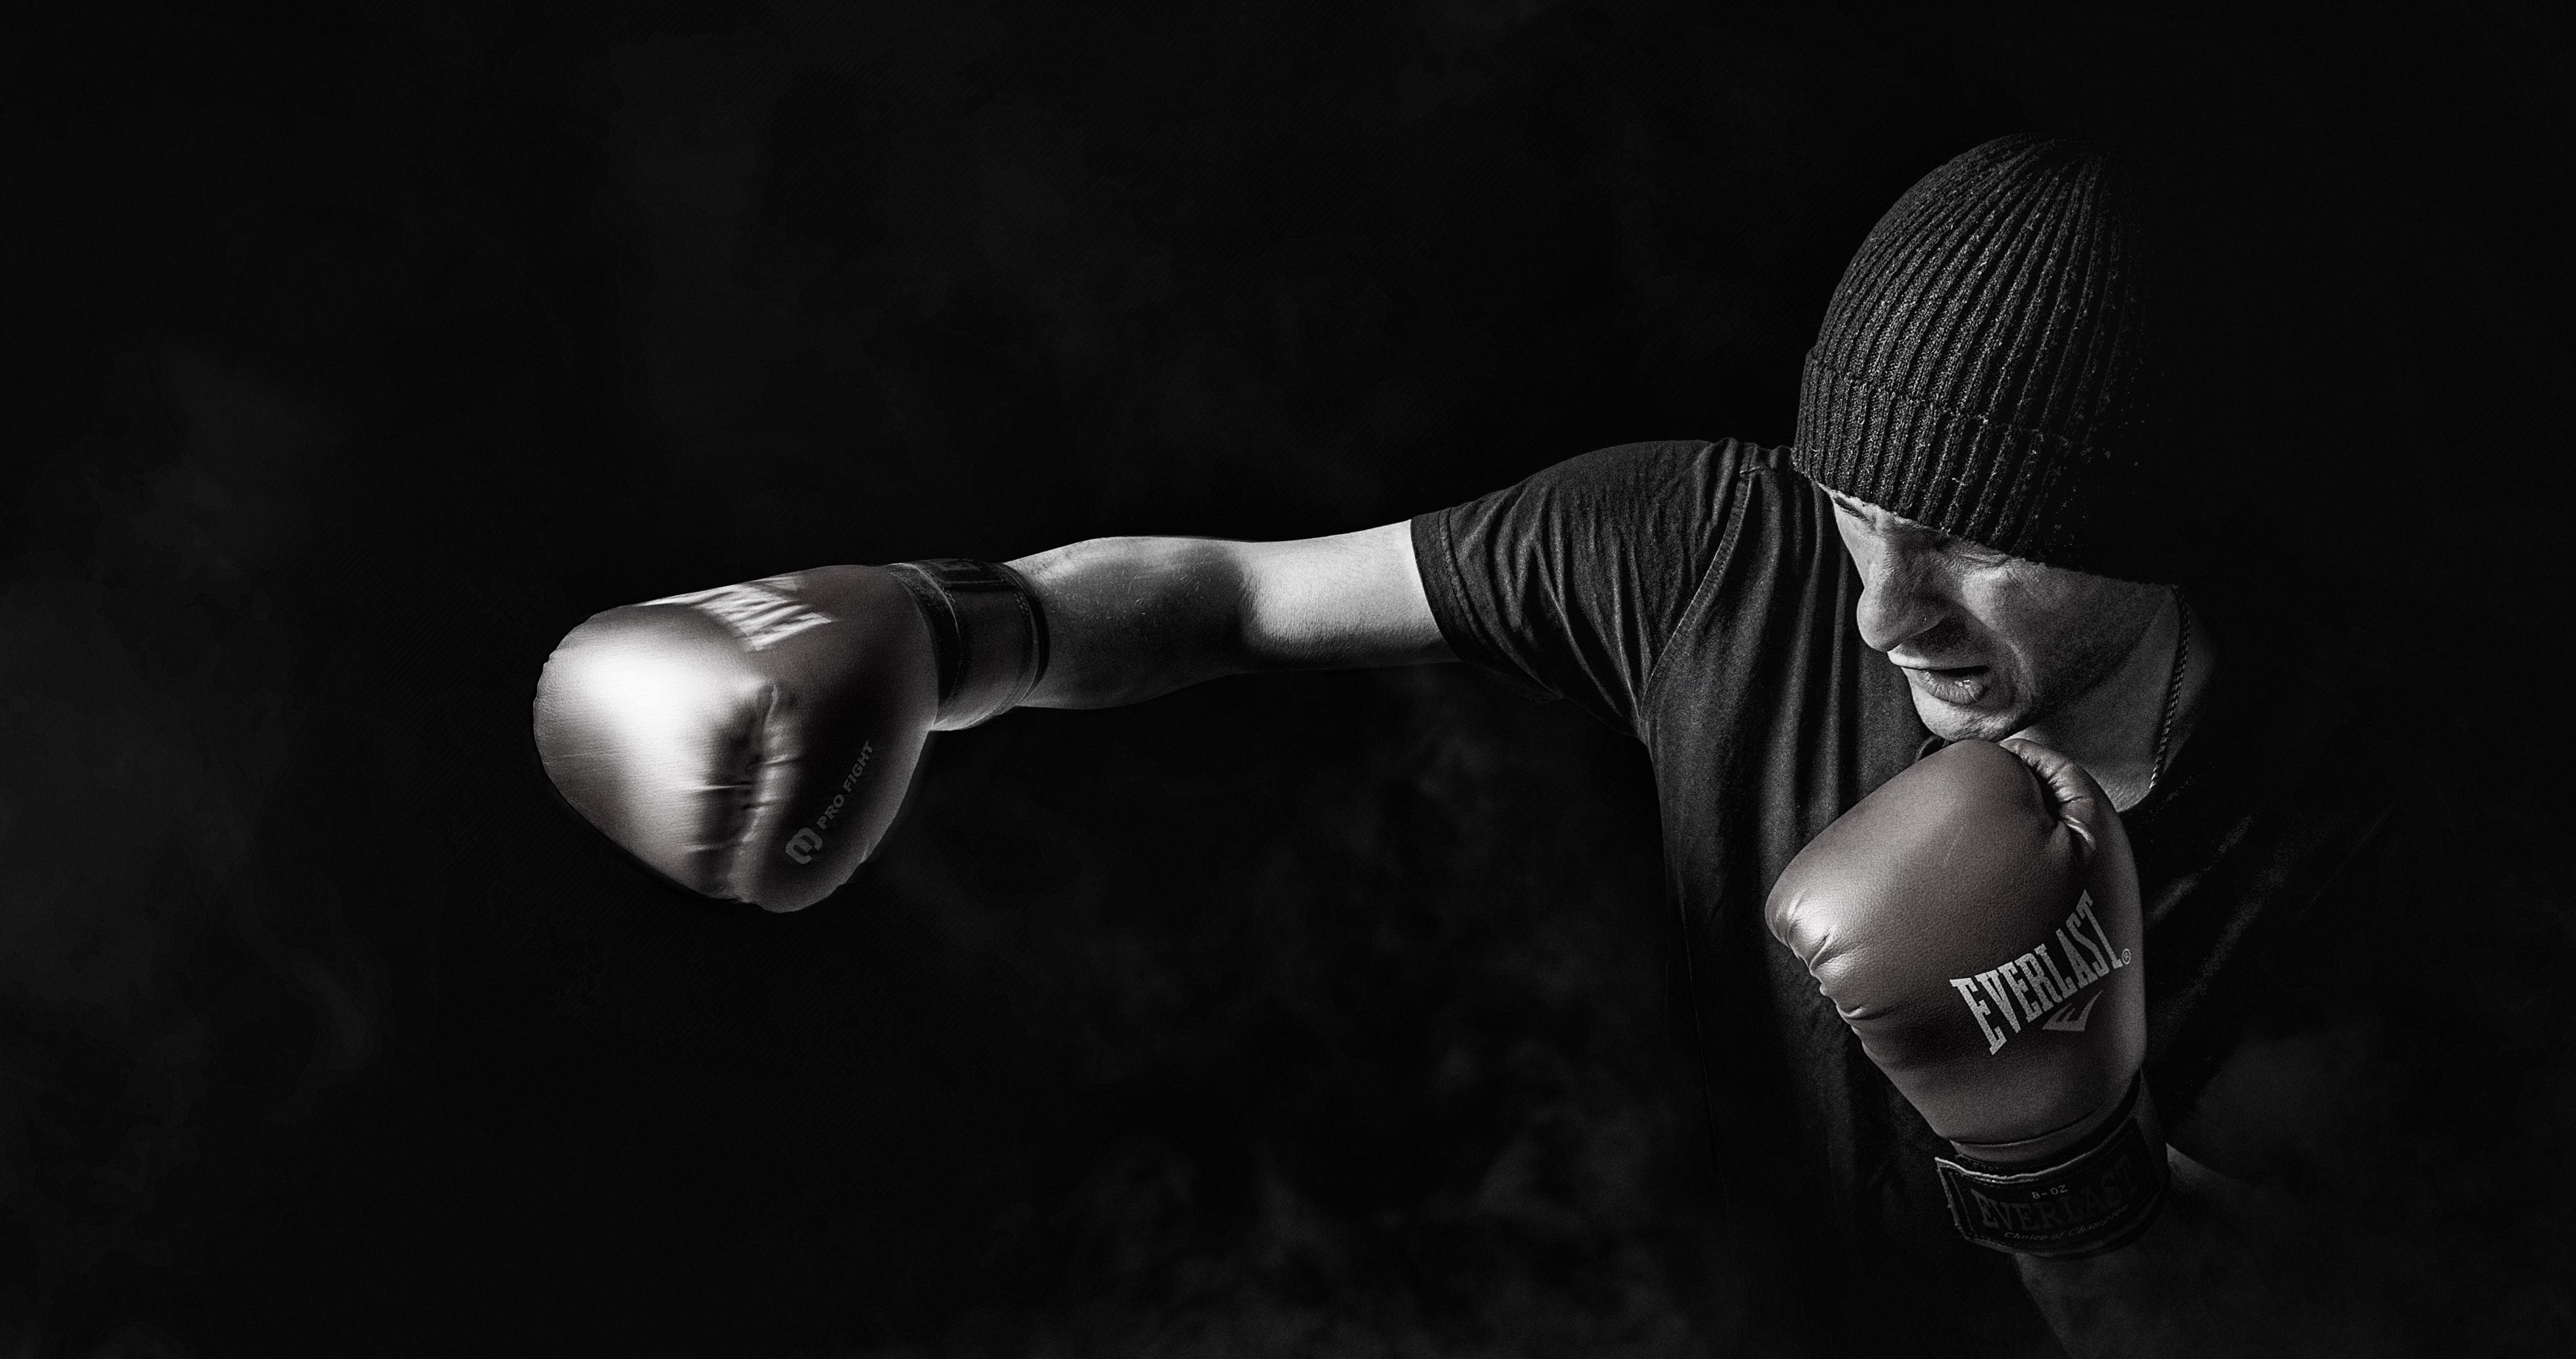 Man Doing Boxing, Male, Training, Strength, Sport, HQ Photo